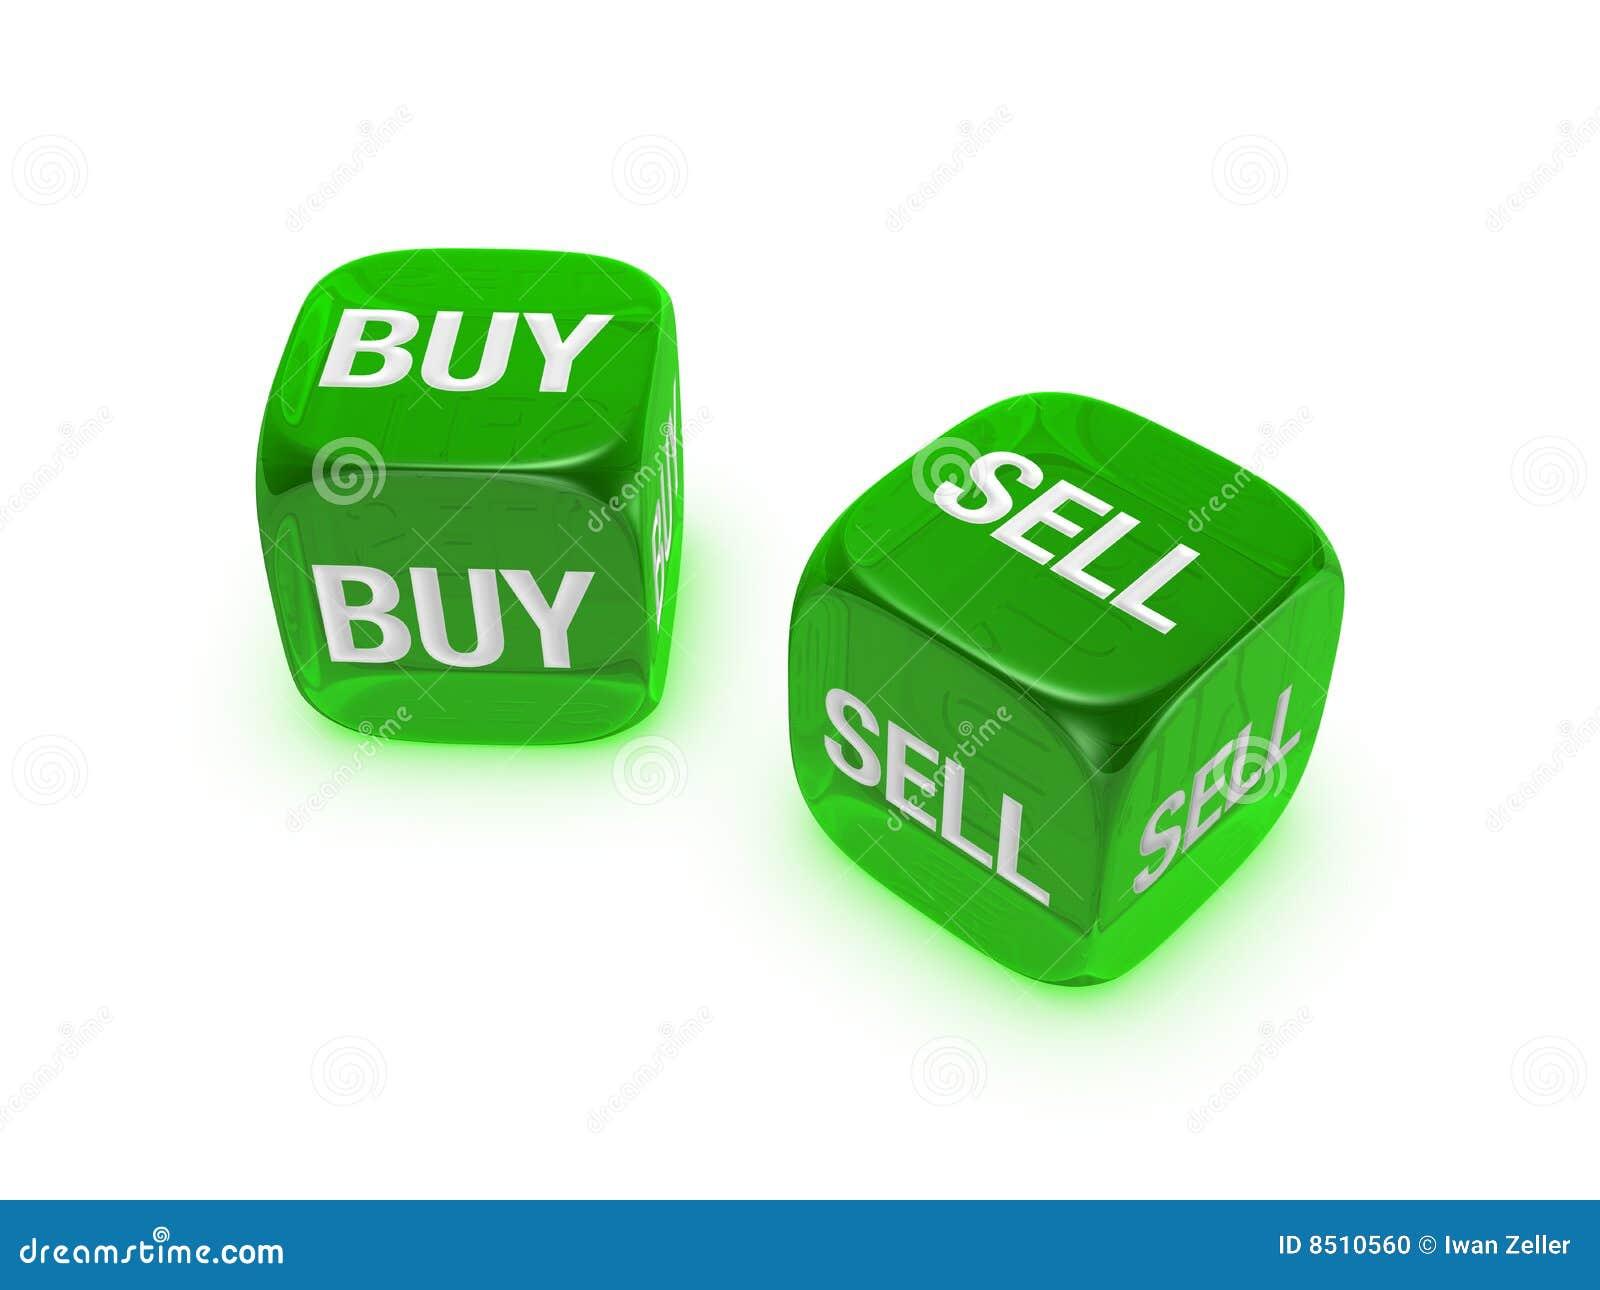 how to buy stocks on commsec